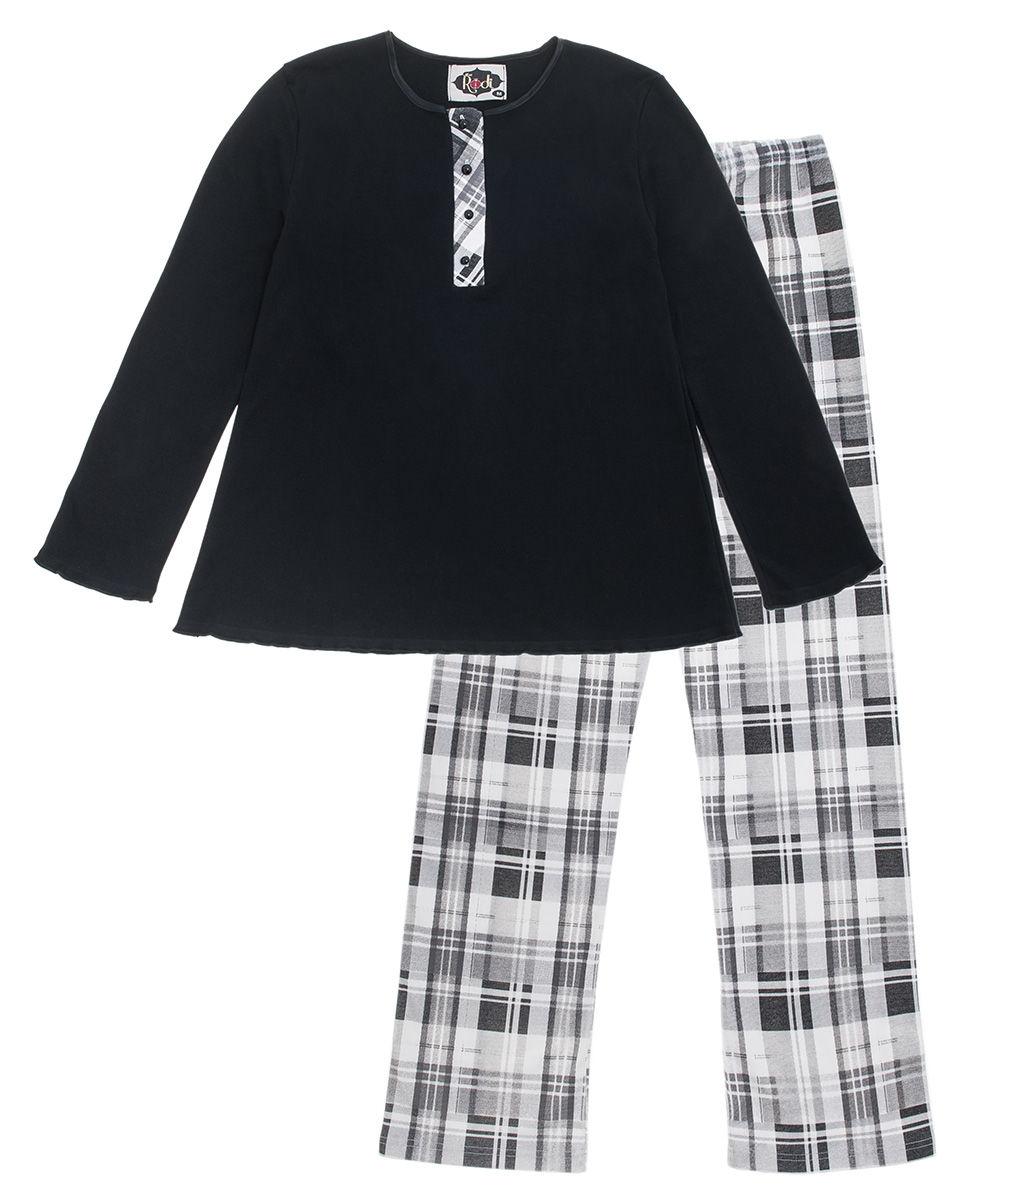 4e259217915 Γυναικεία πυτζάμα βαμβακερή μαύρη με καρώ παντελόνι - Per mia Donna